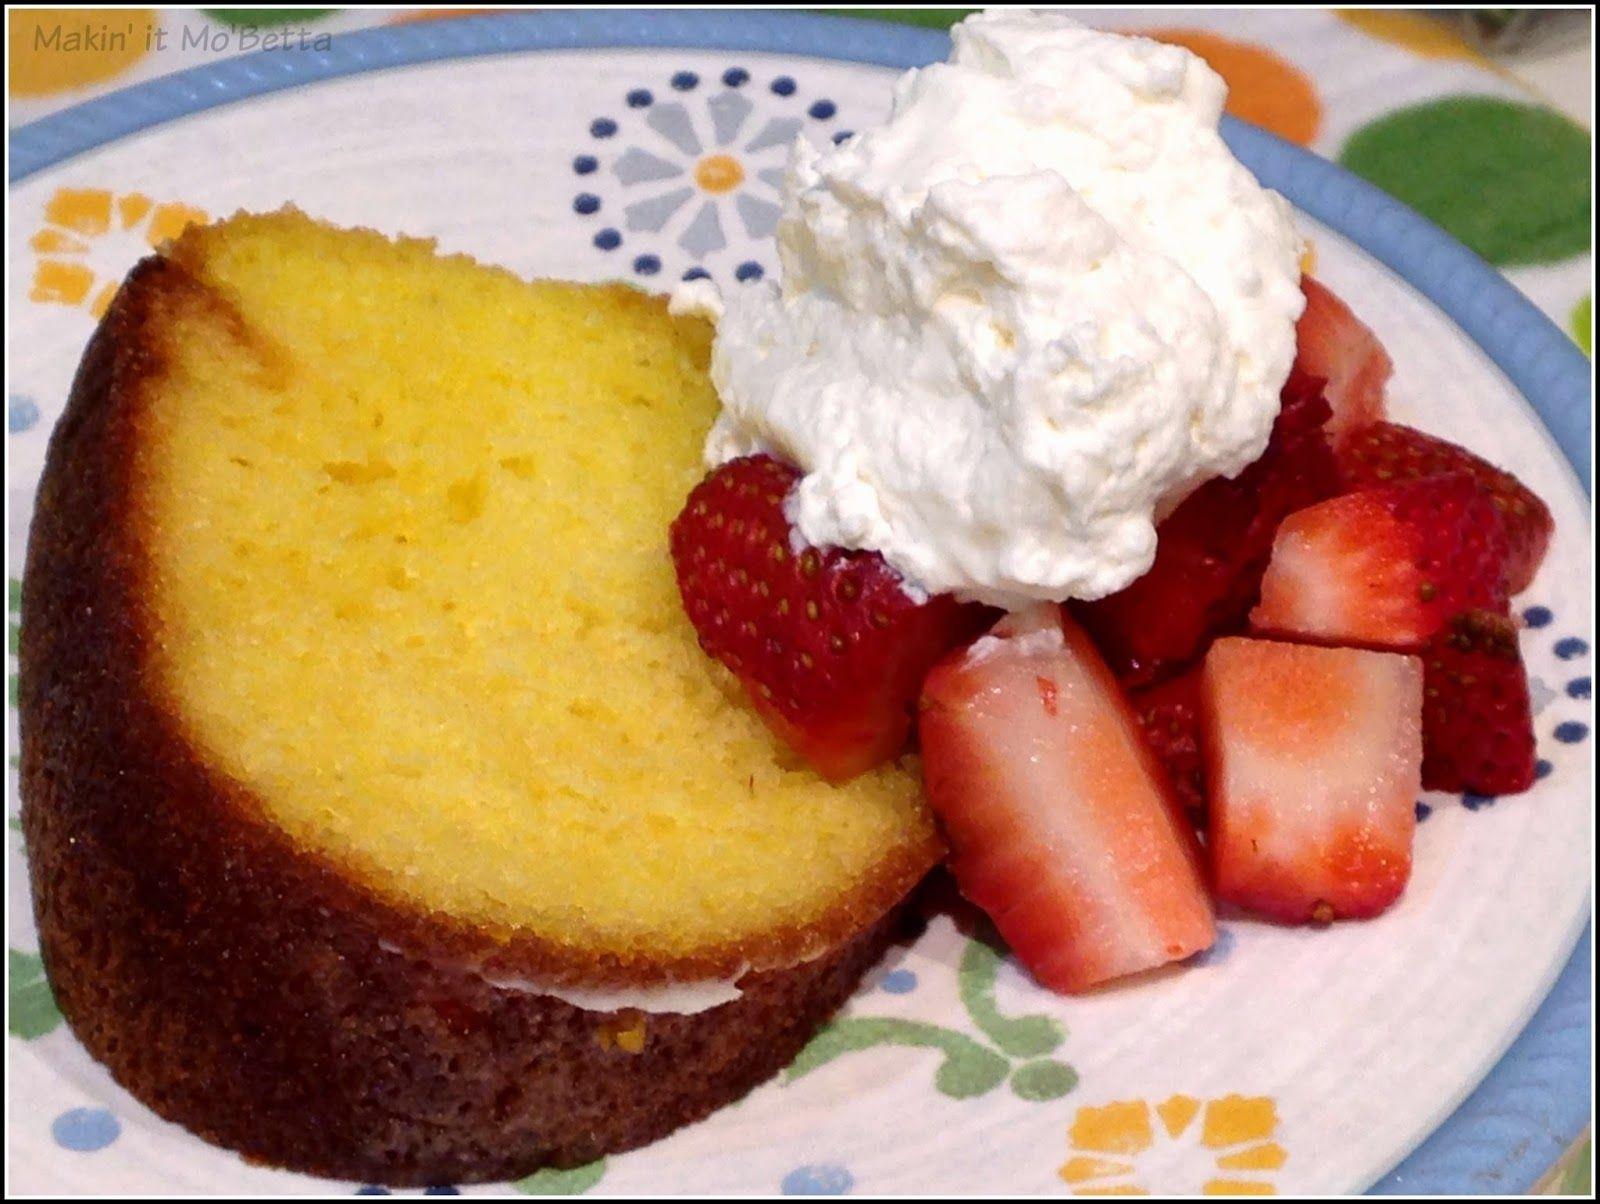 Lemon Supreme Pound Cake Starts With A Mix Cake Mix Recipes Pound Cake Pound Cake Recipes